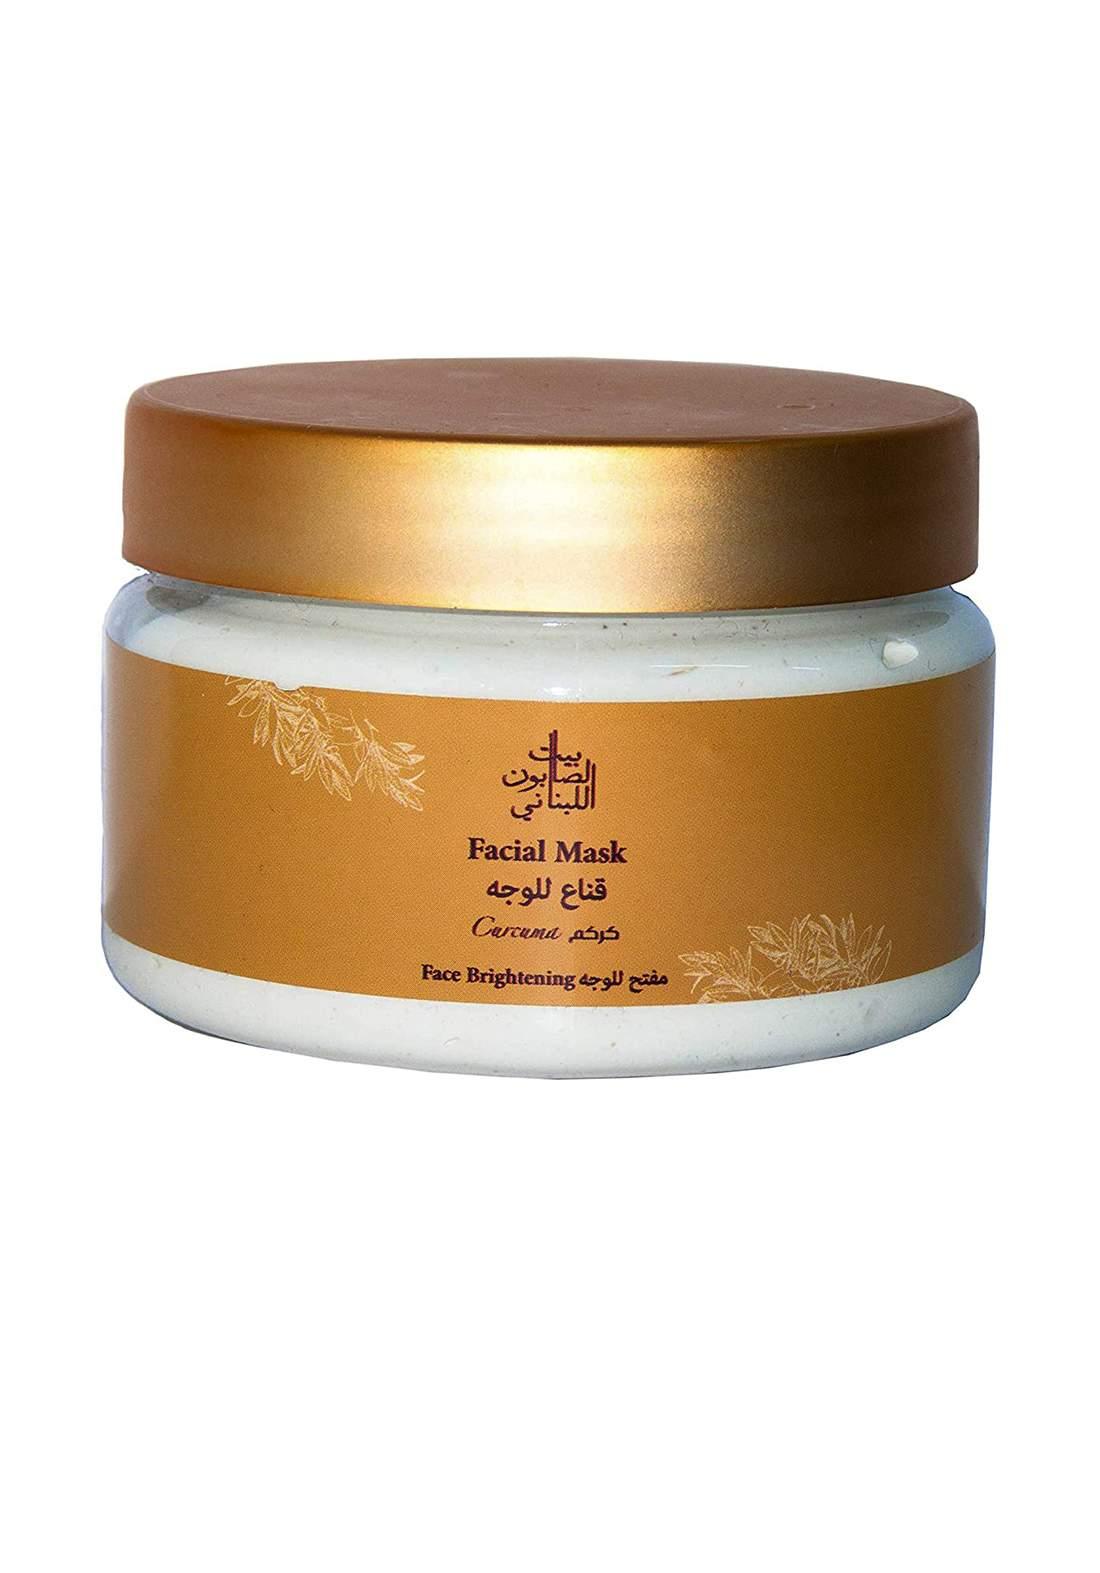 Bayt Alsaboun Alloubnani-317479 Facial Mask Curcuma 300g ماسك للبشرة